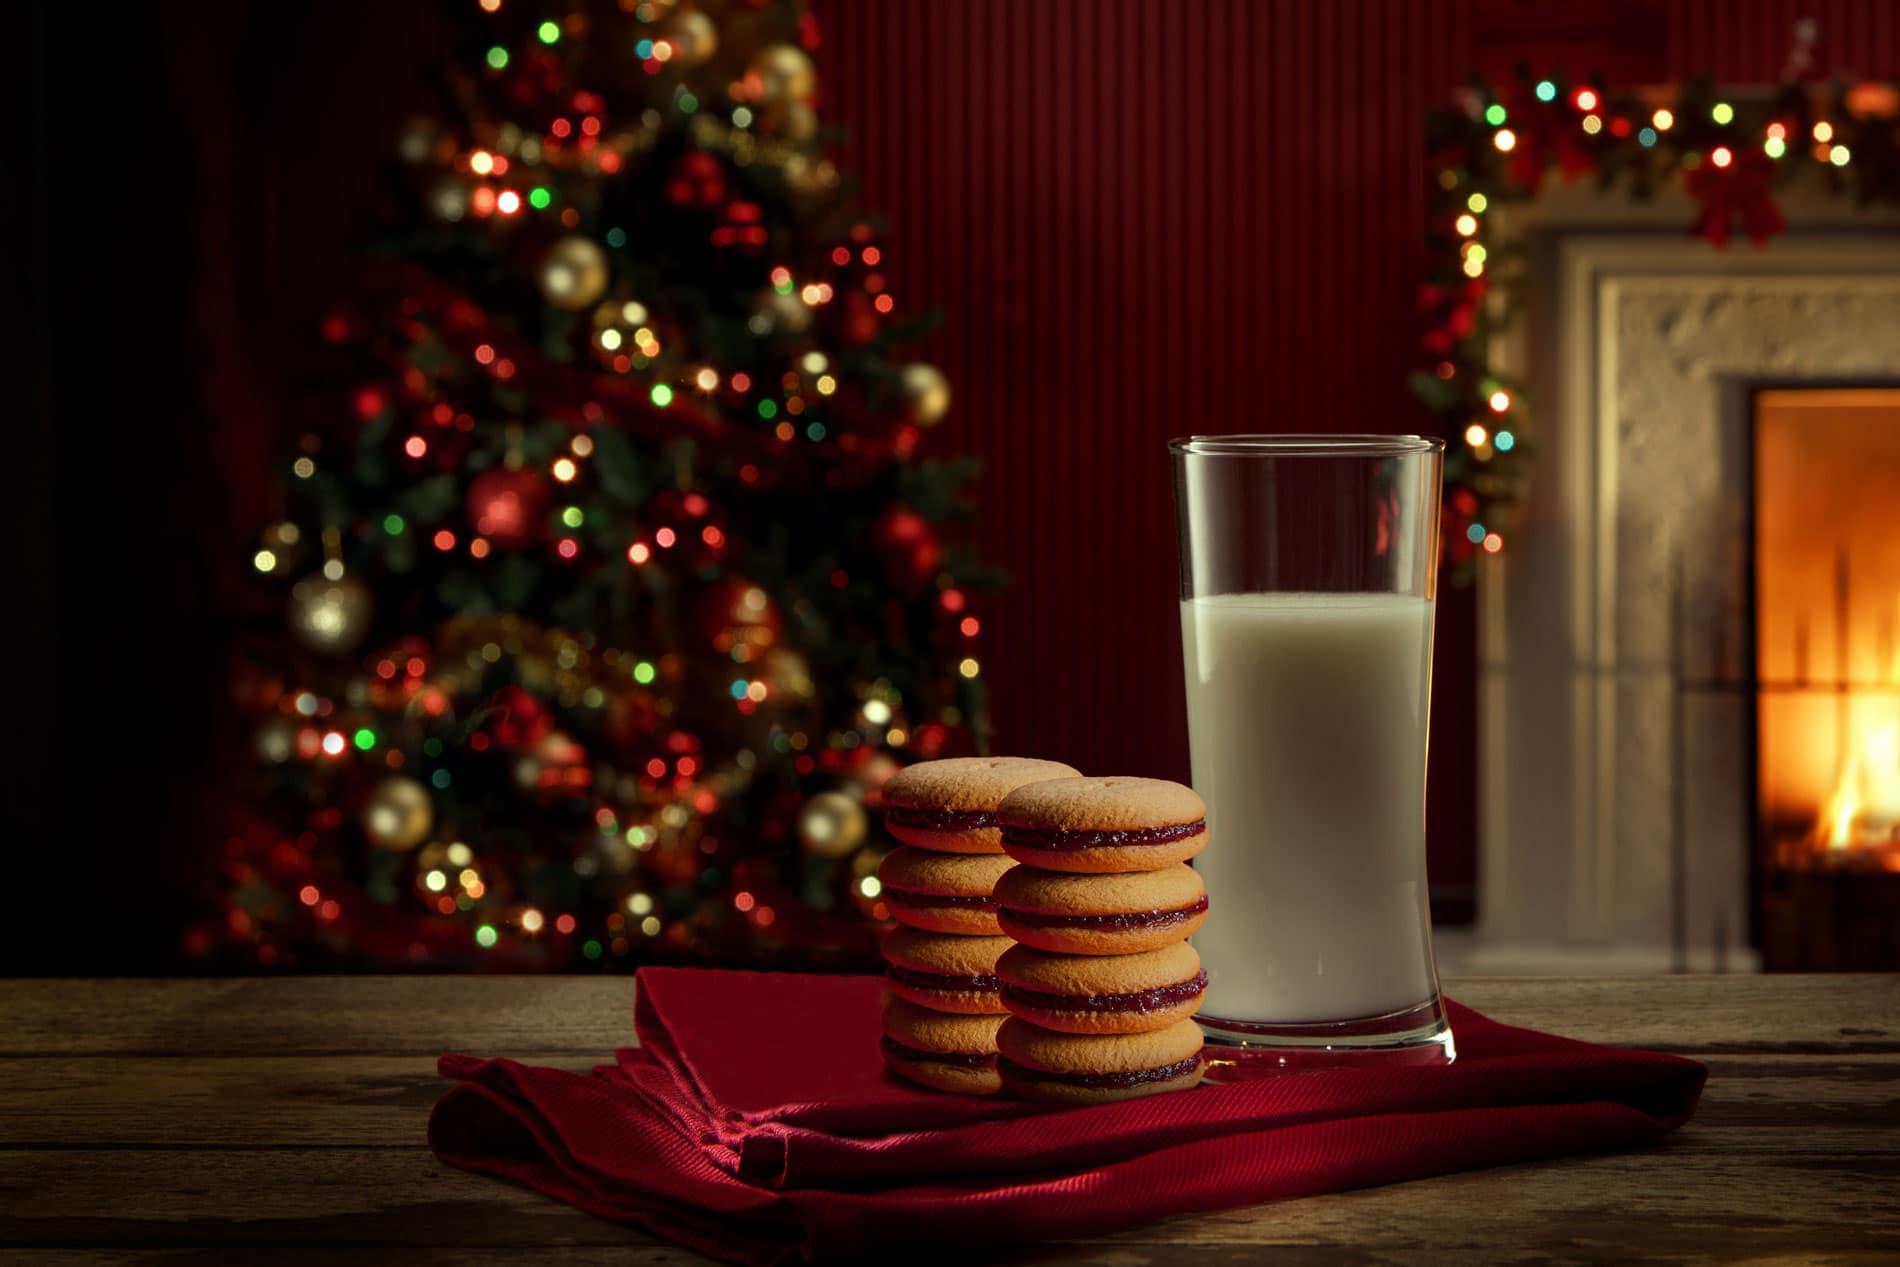 Everything Christmas – Every Night Before